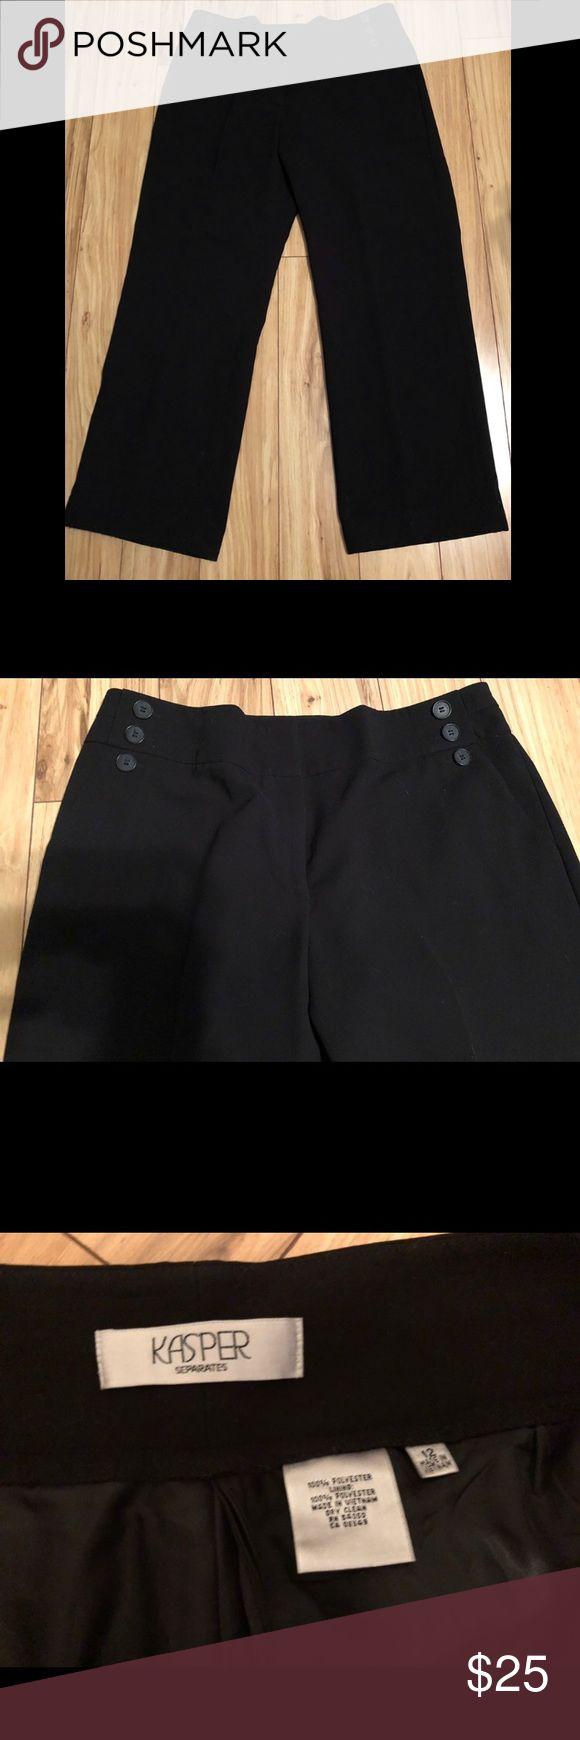 Dress Pants - Kasper Suit Separates Worn only once! Perfect condition! Kasper Pants